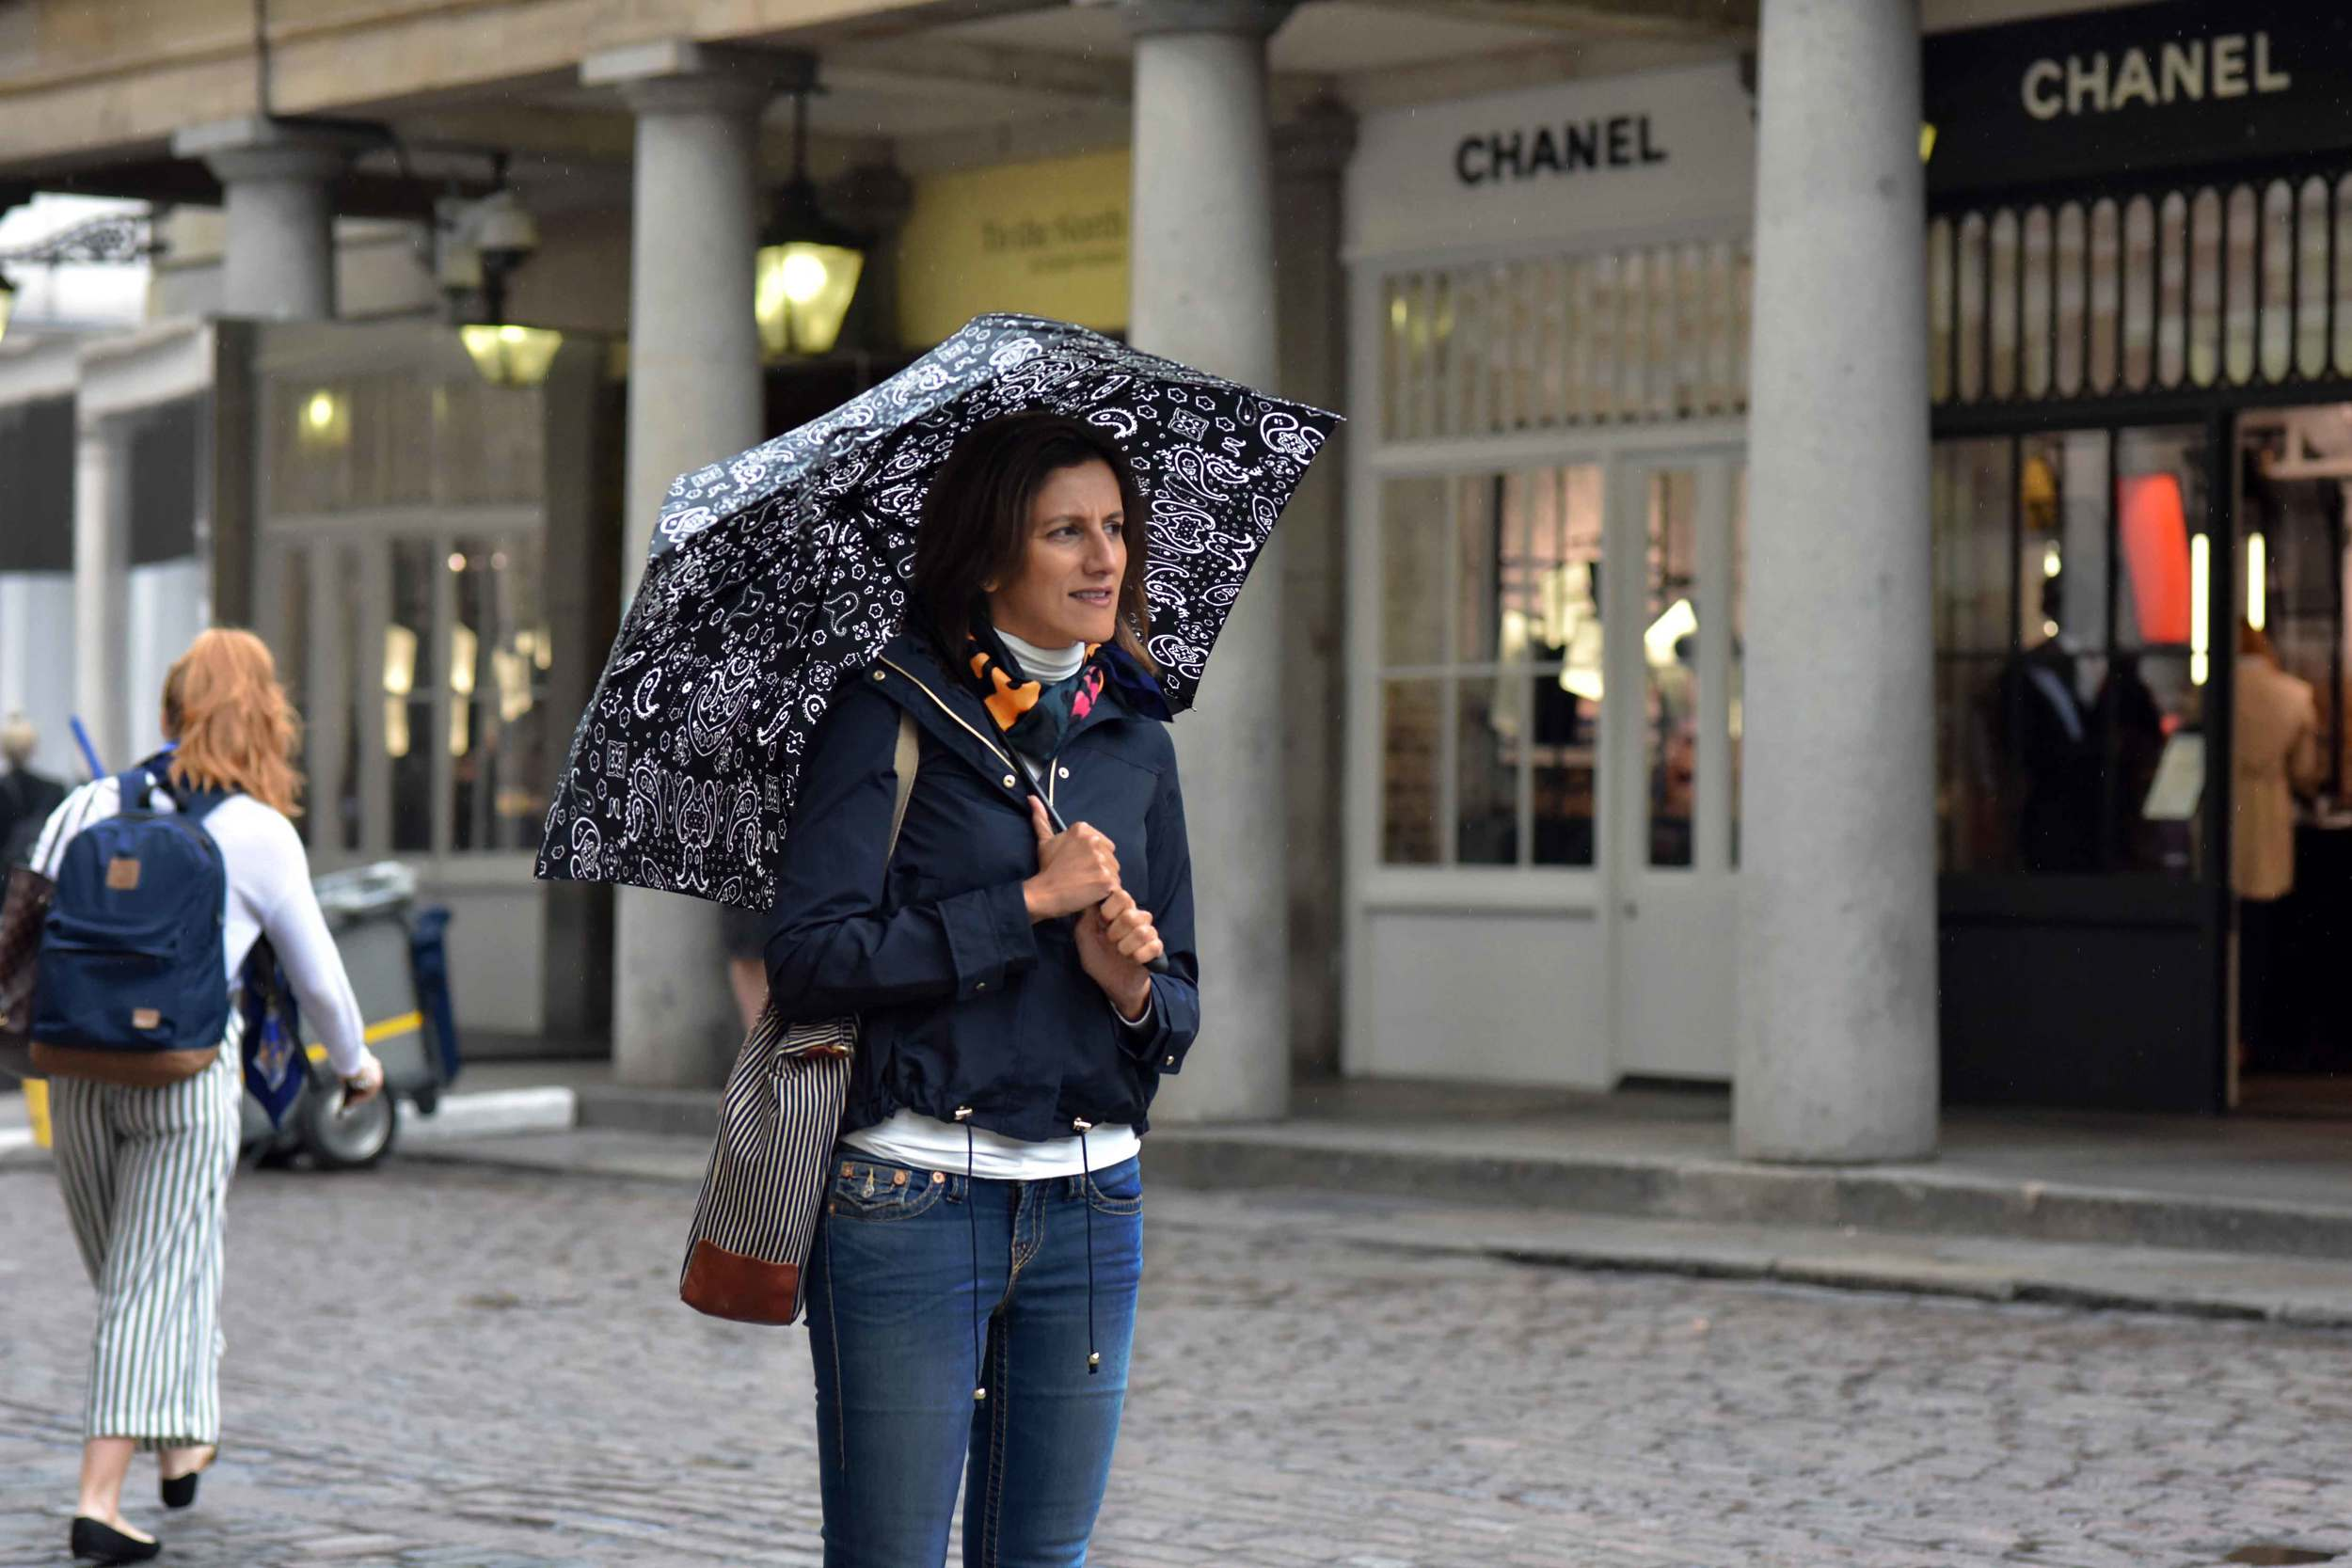 Zara water repellent jacket, Ralph Lauren polo sweater, Zara printed pocket square, Zara bandana print umbrella, True Religion jeans, Covent Garden, London, UK. Image©sourcingstyle.com